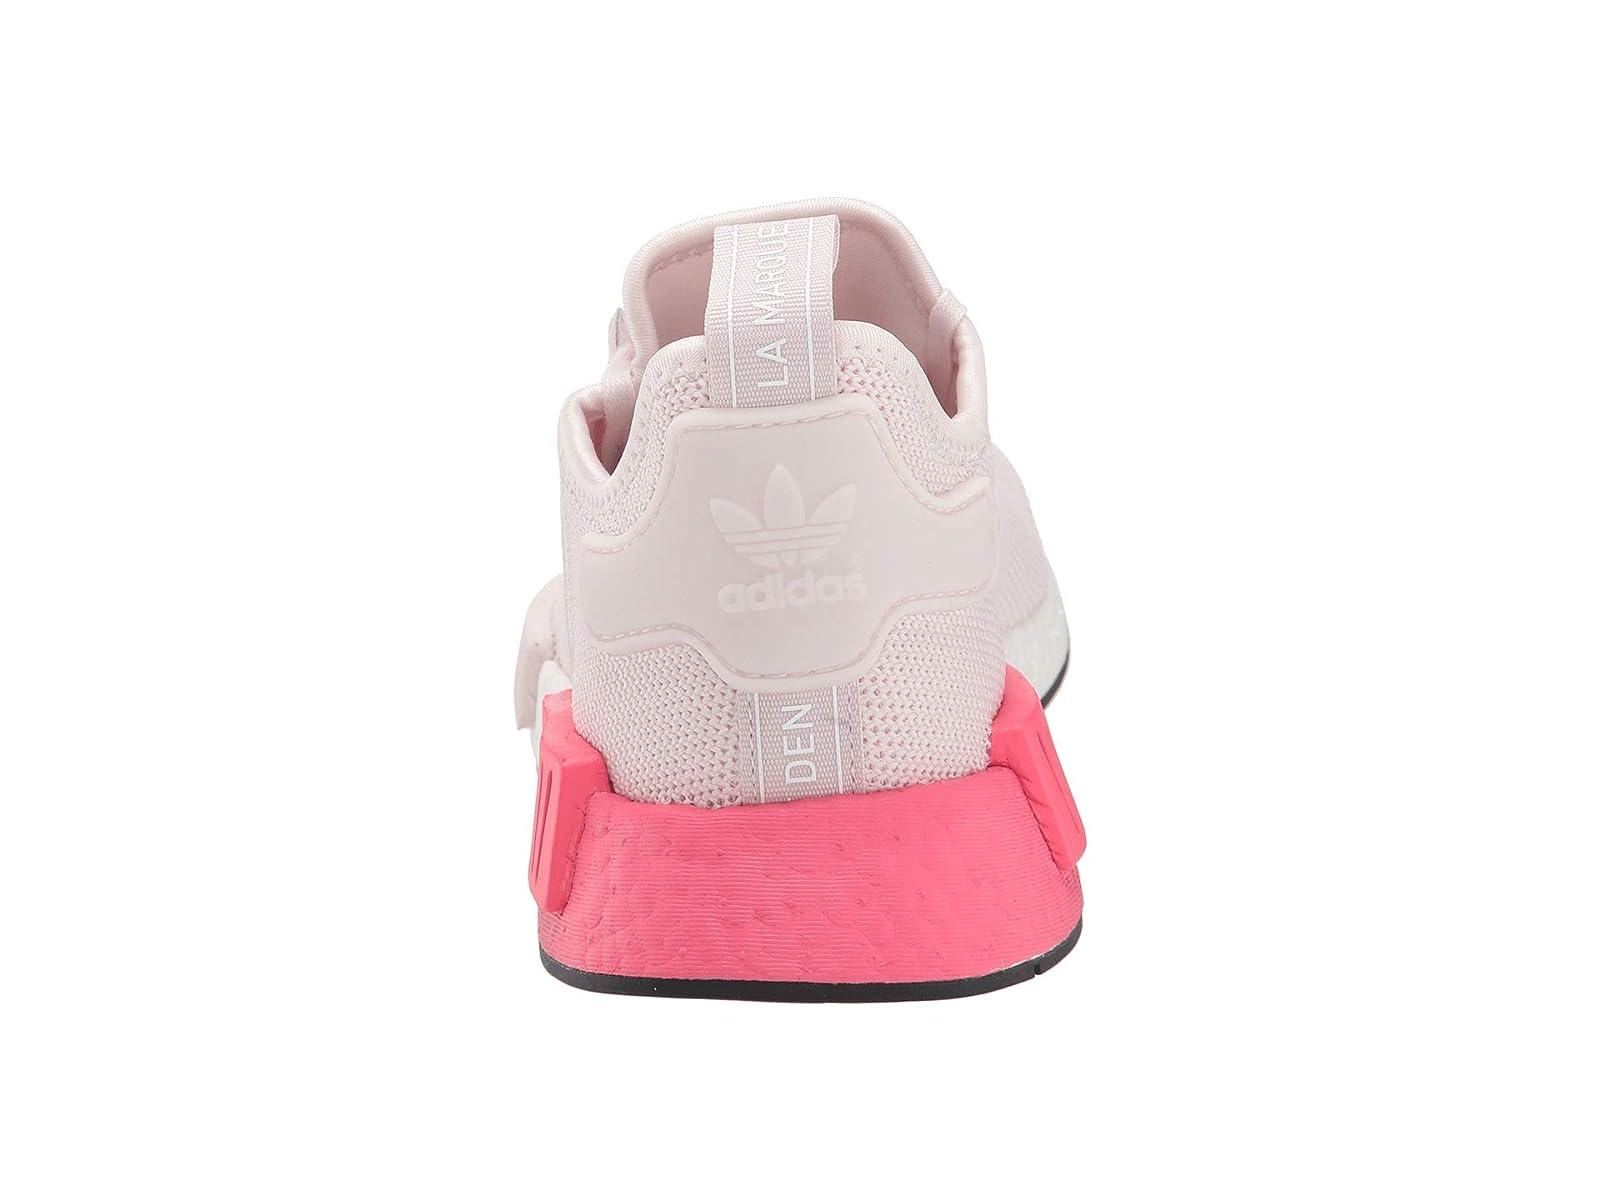 Girl-039-s-Sneakers-amp-Athletic-Shoes-adidas-Originals-Kids-NMD-R1-J-Big-Kid thumbnail 6